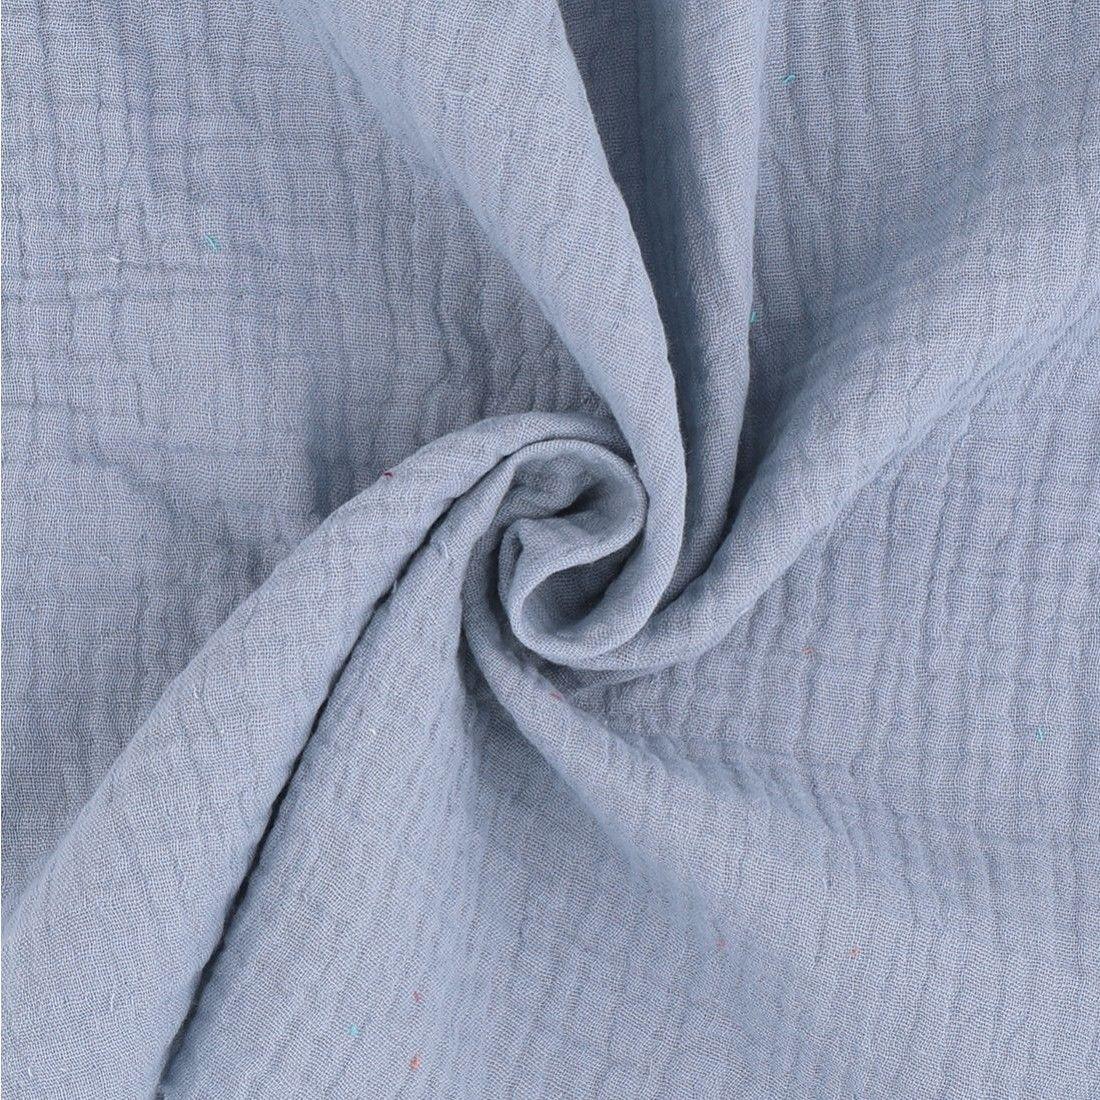 03dd6aa5e7c6b Tissu double gaze coton bleu/gris - Mondial Tissus   Couture * Idées ...